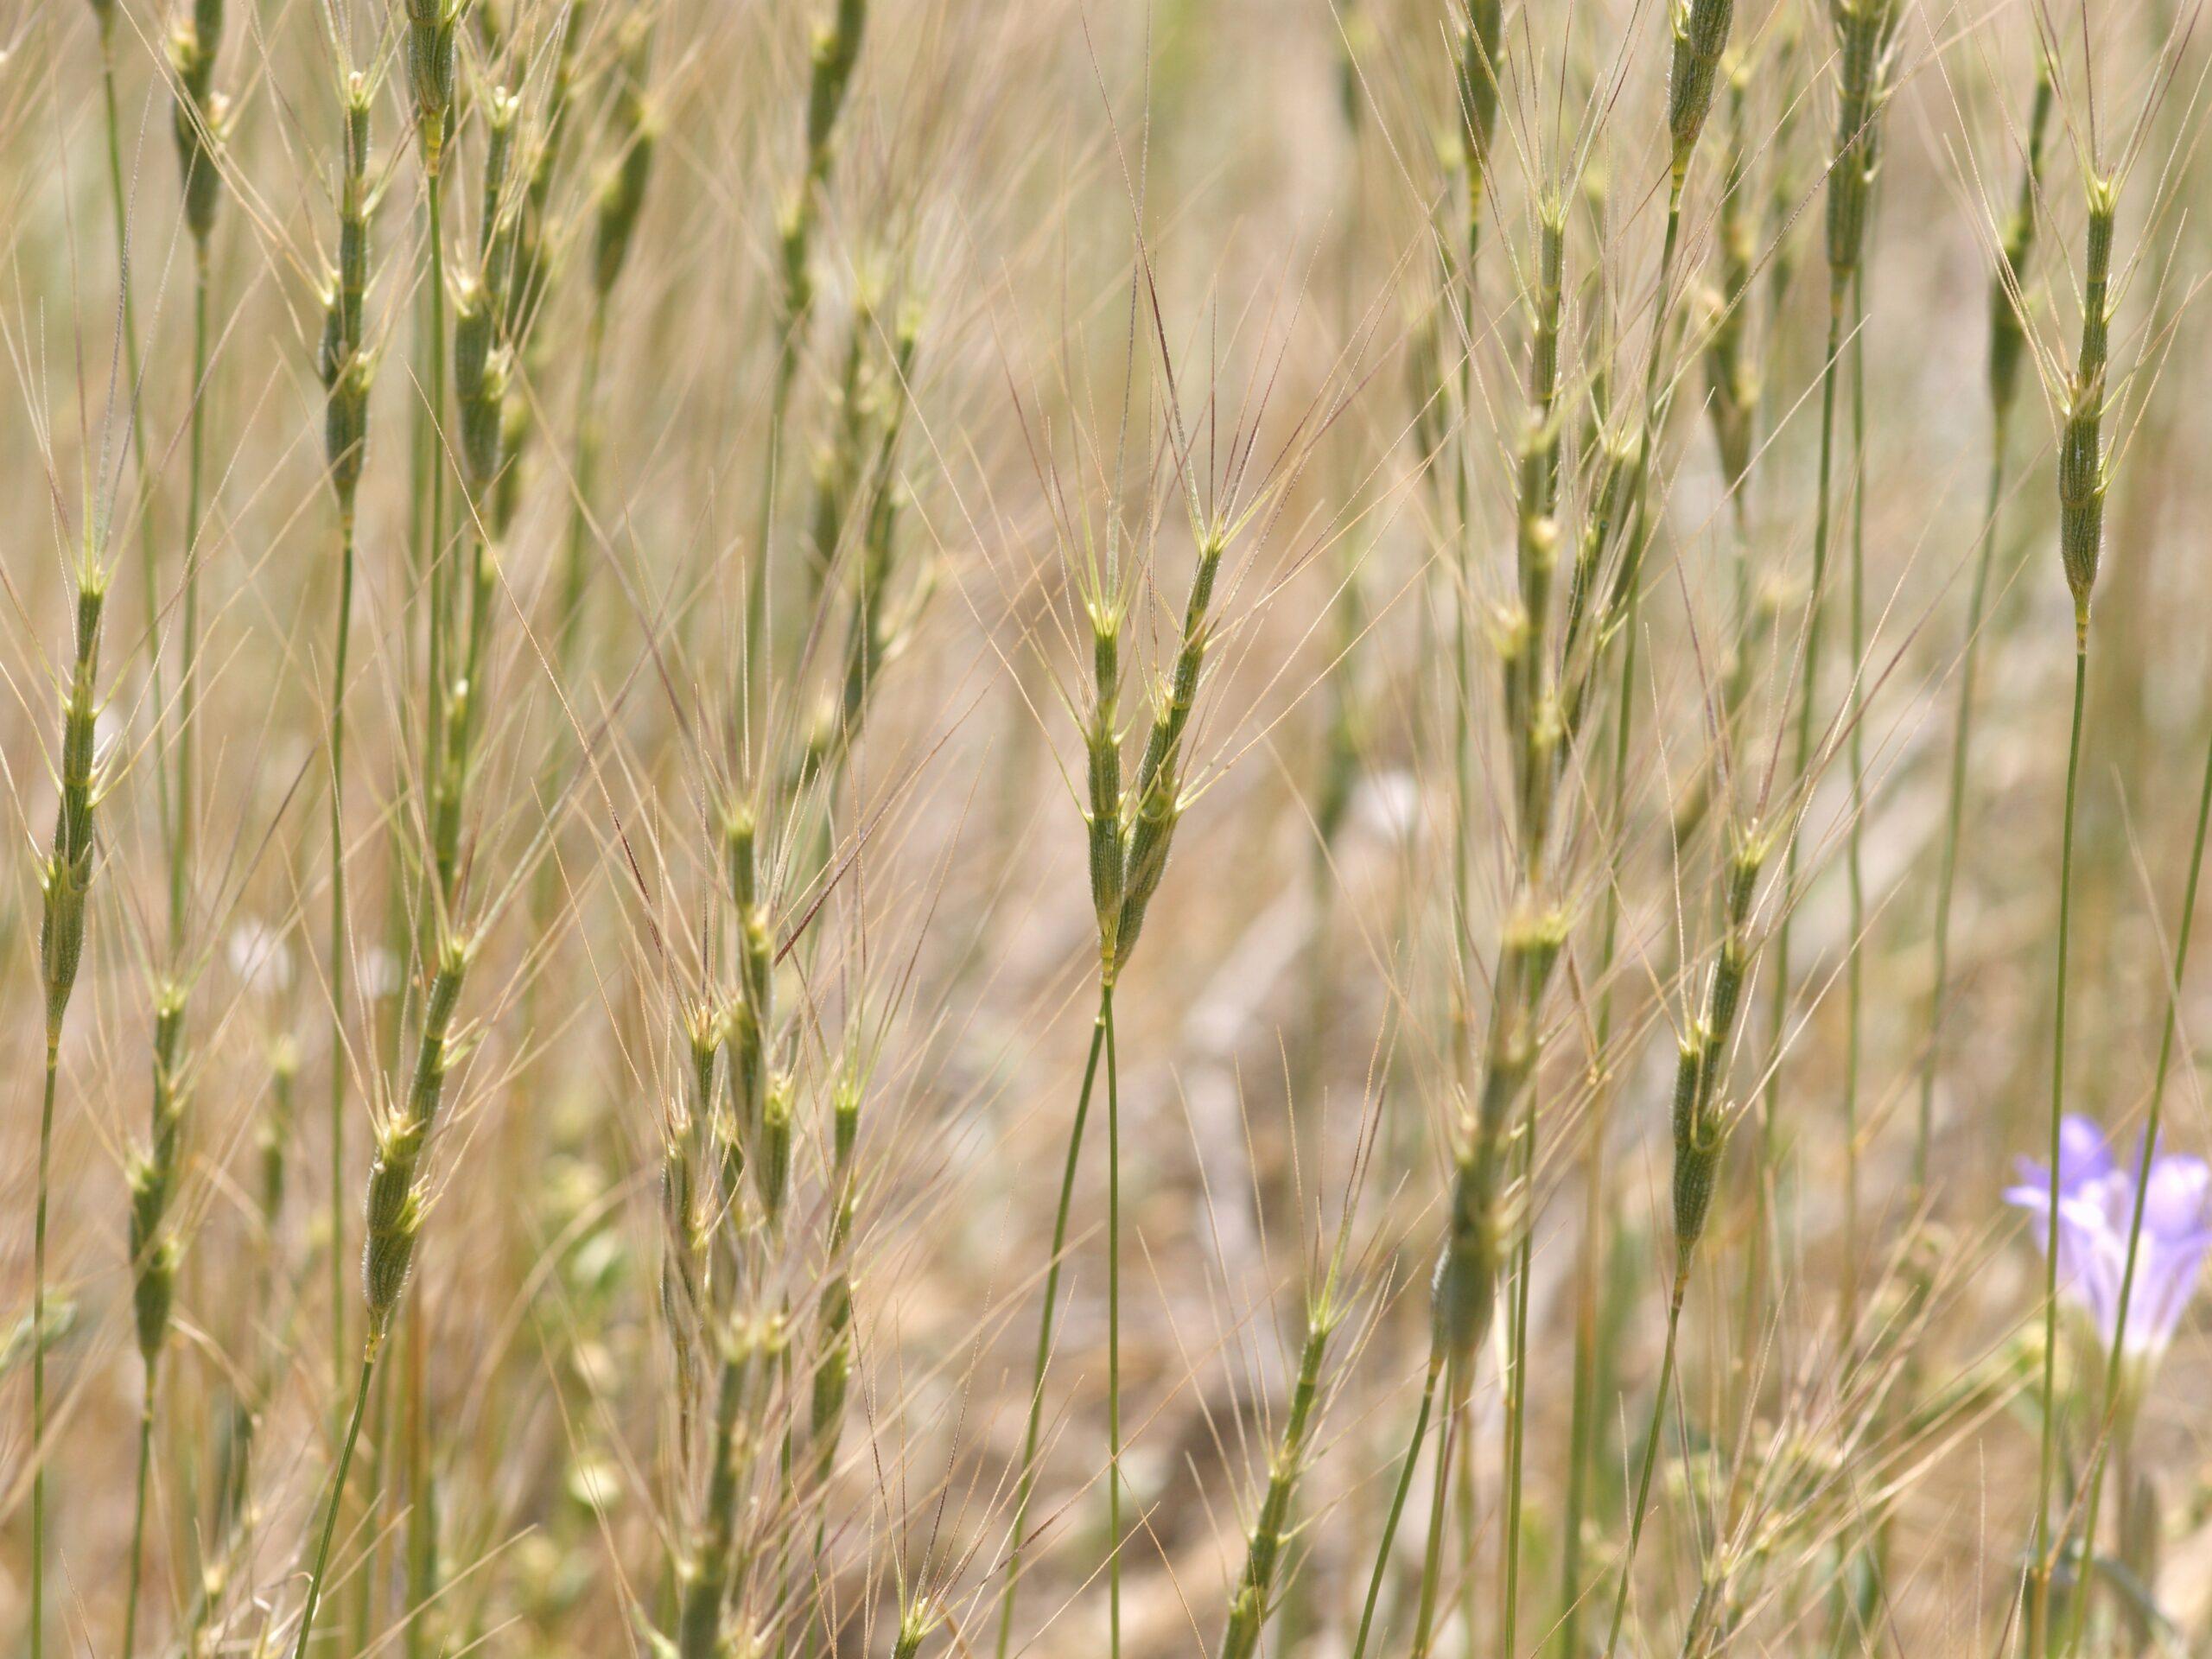 Aegilops-triuncialis_barb-goatgrass_BobCase_cropped-scaled.jpg